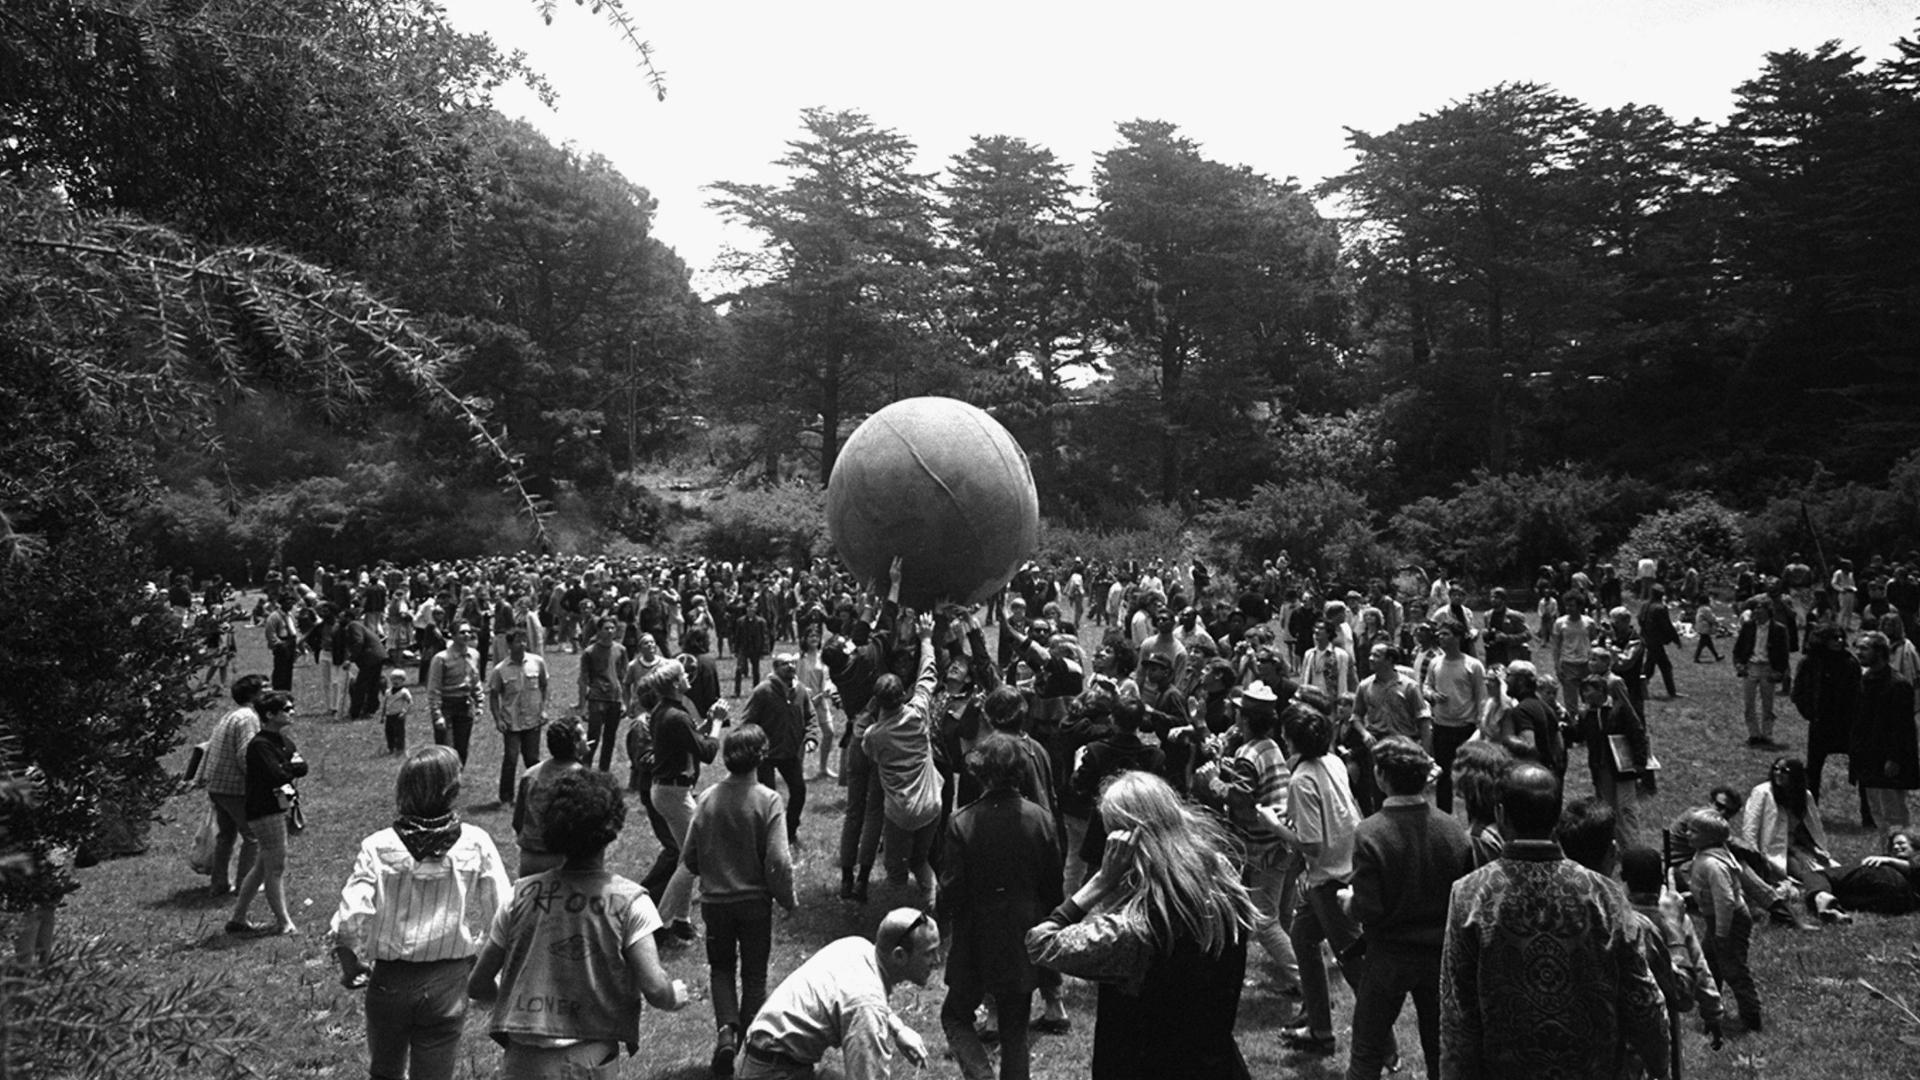 Summer of Love 1967, SAN FRANCISCO, USA